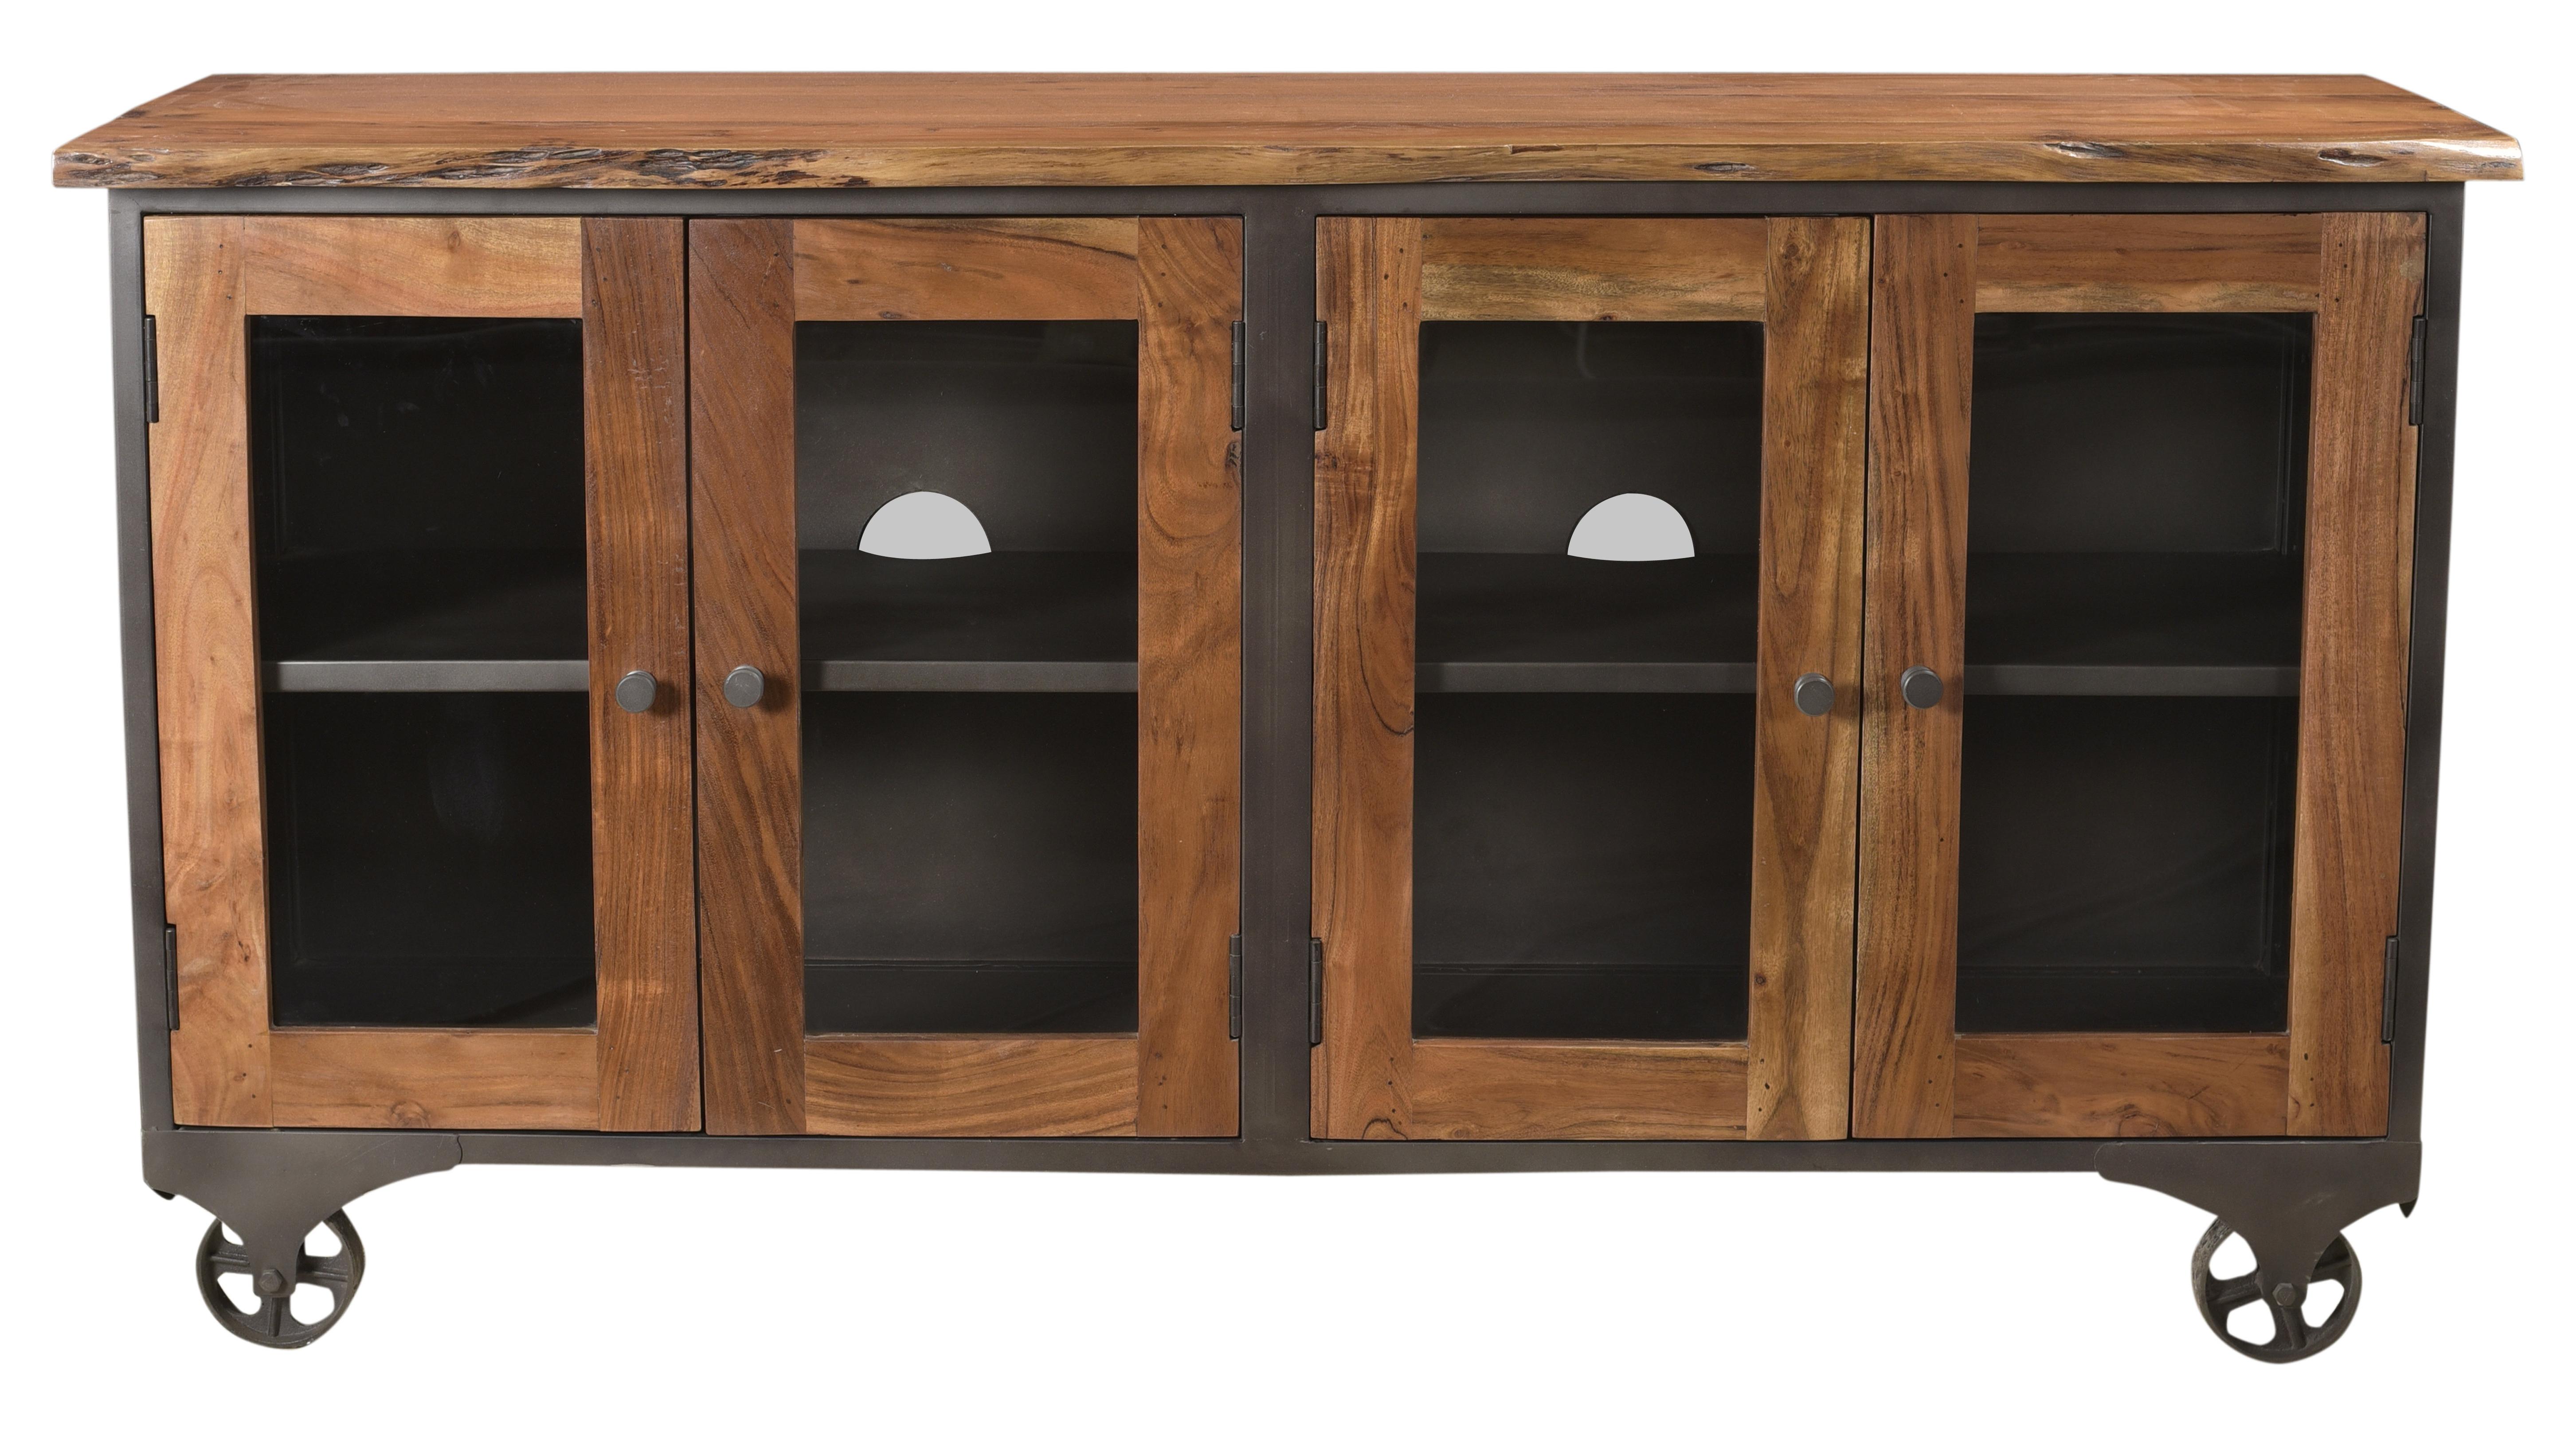 Arminta Wood Sideboards In Recent Hessler Sideboard (View 12 of 20)